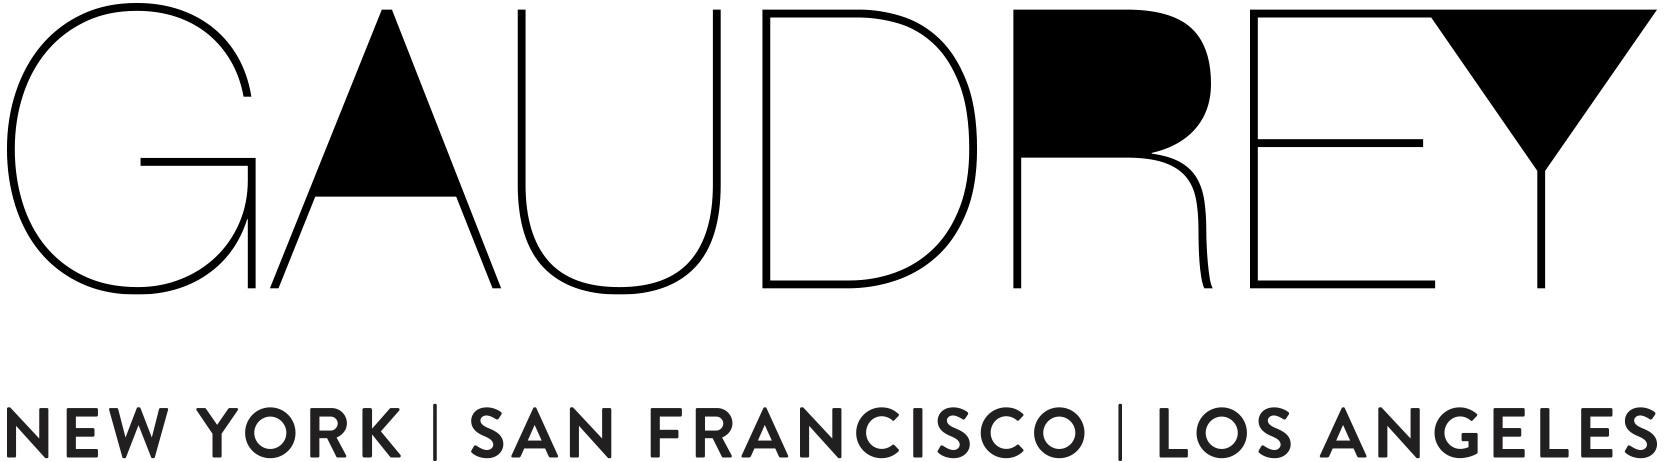 gaudrey+logo.jpg